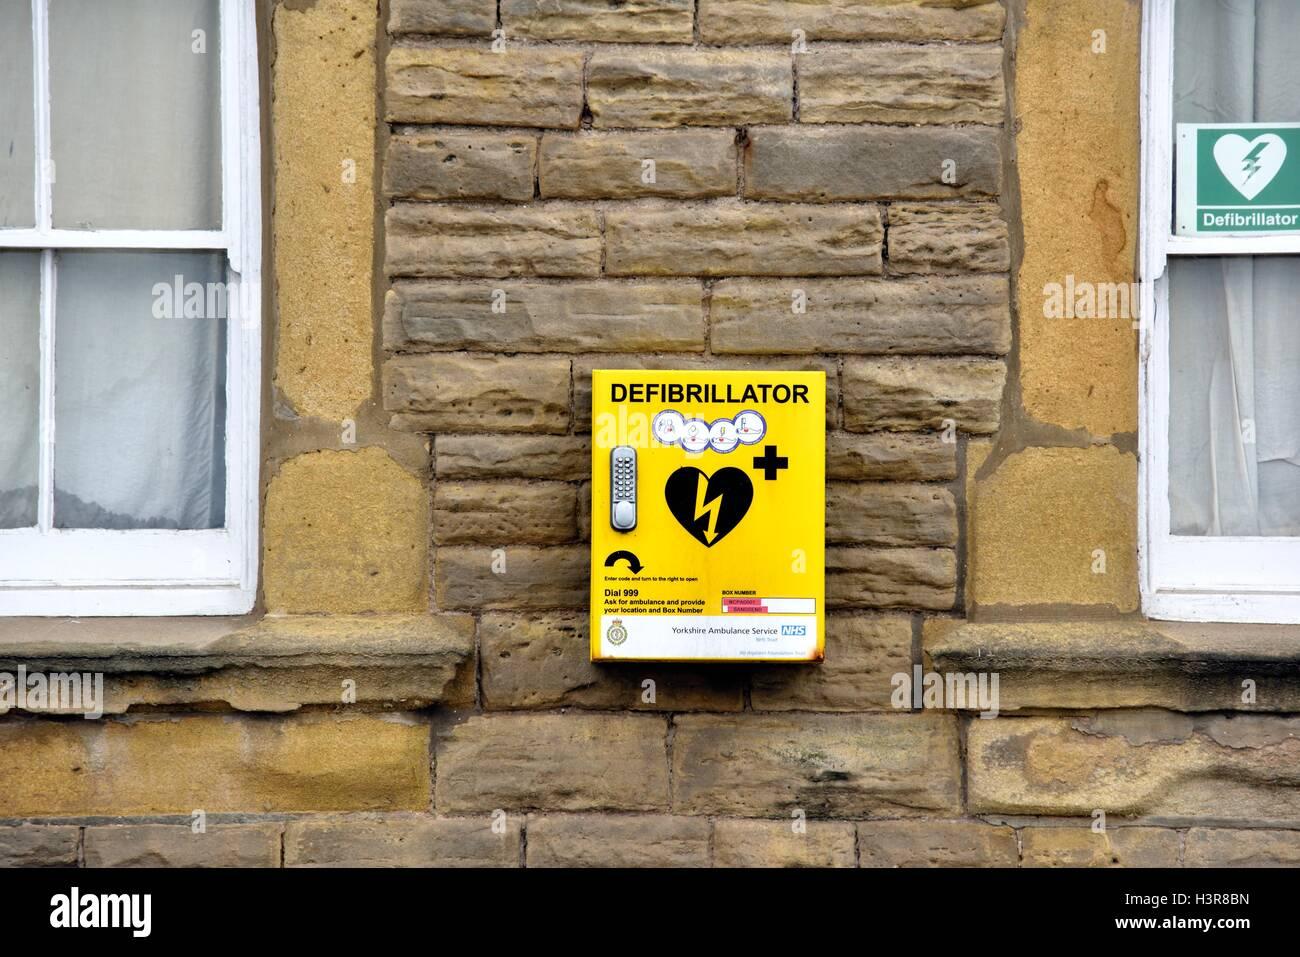 emergency Defibrillator. - Stock Image